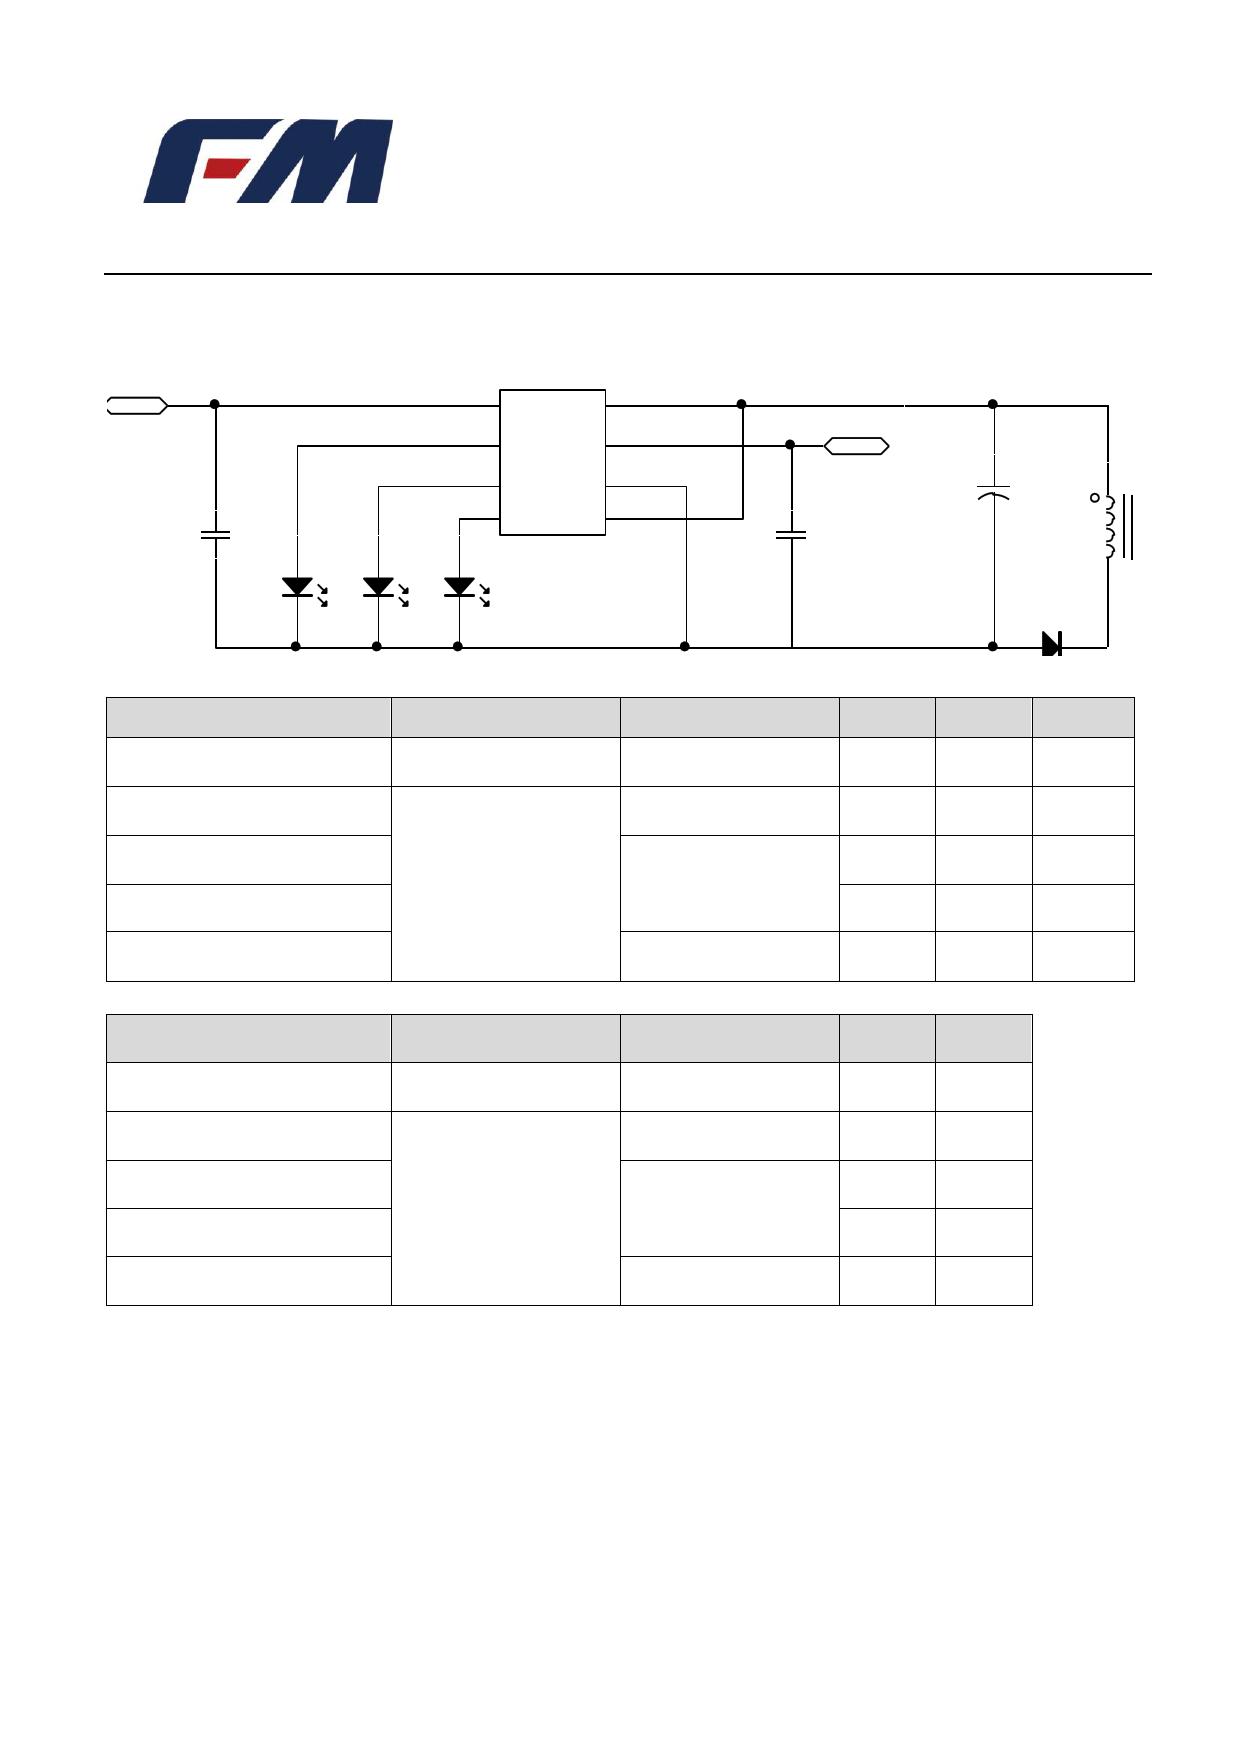 TC3586 pdf, schematic